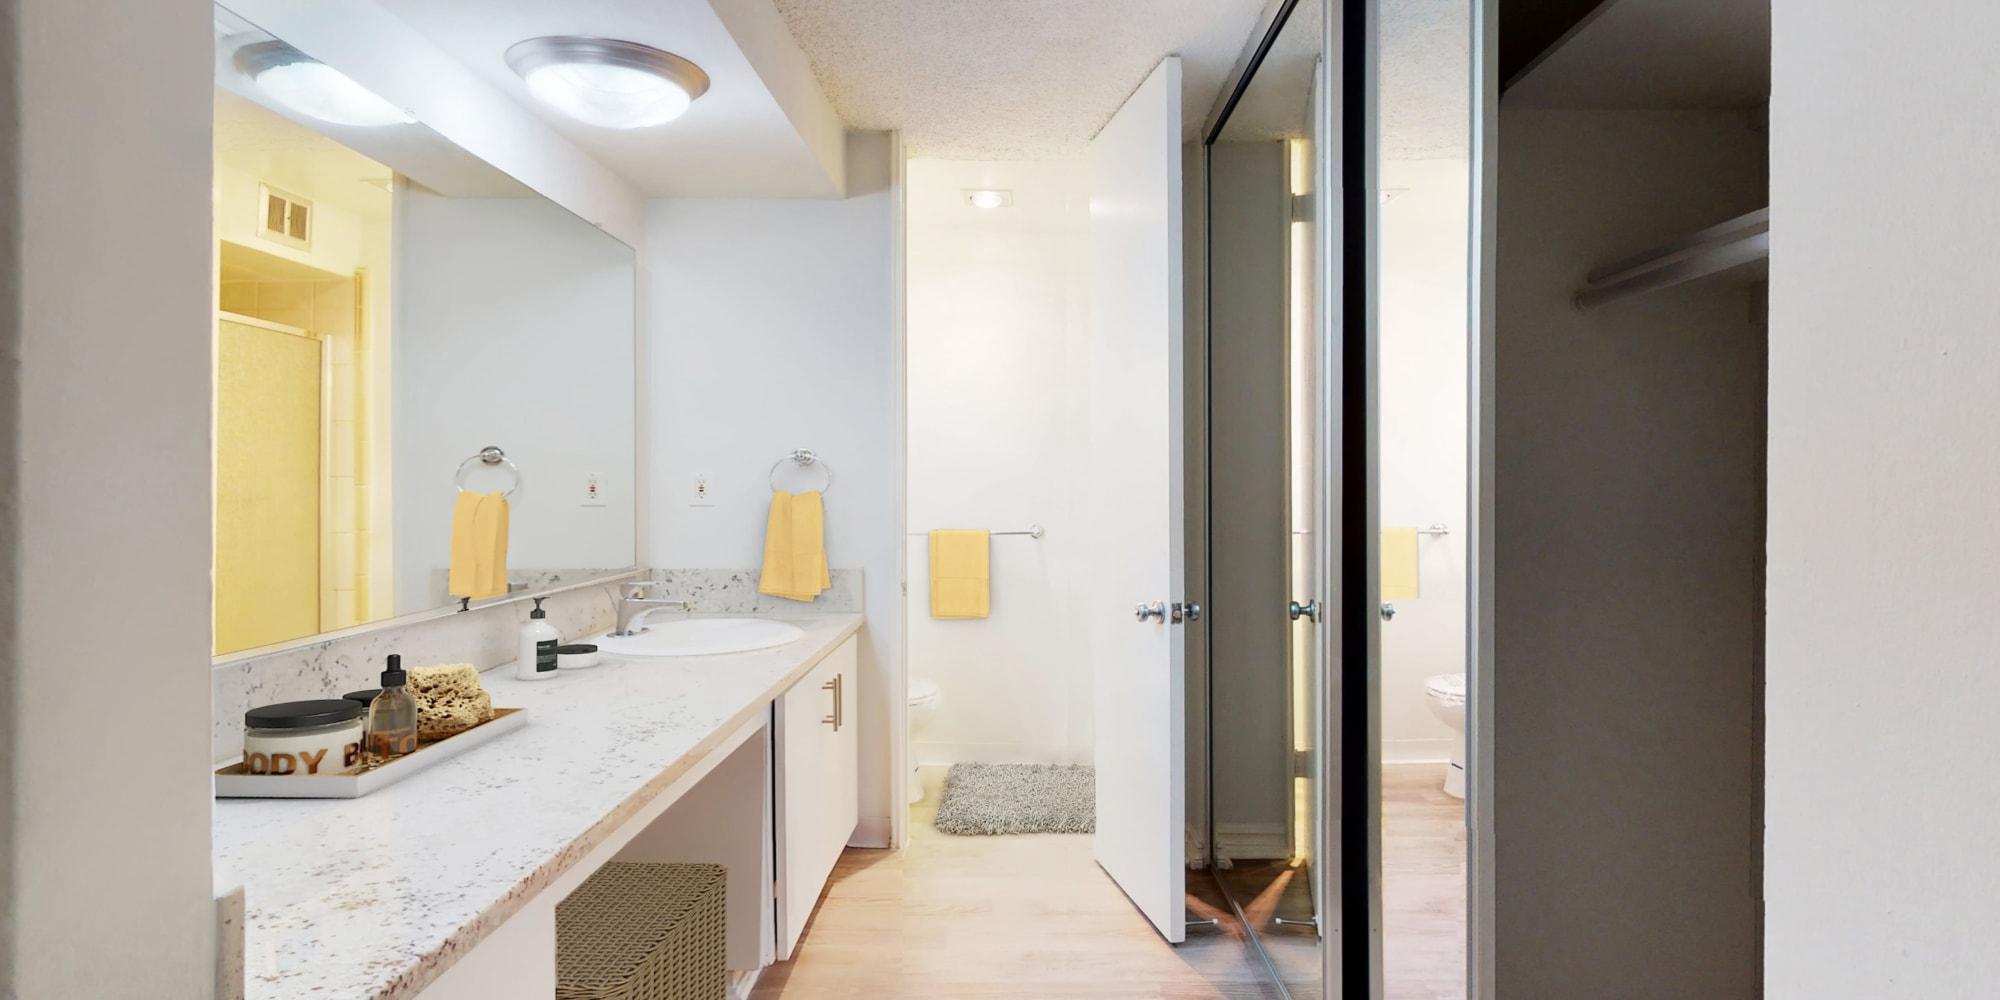 Bathroom view with spacious countertop and closets of a Studio model apartment at Casa Granada in Los Angeles, California